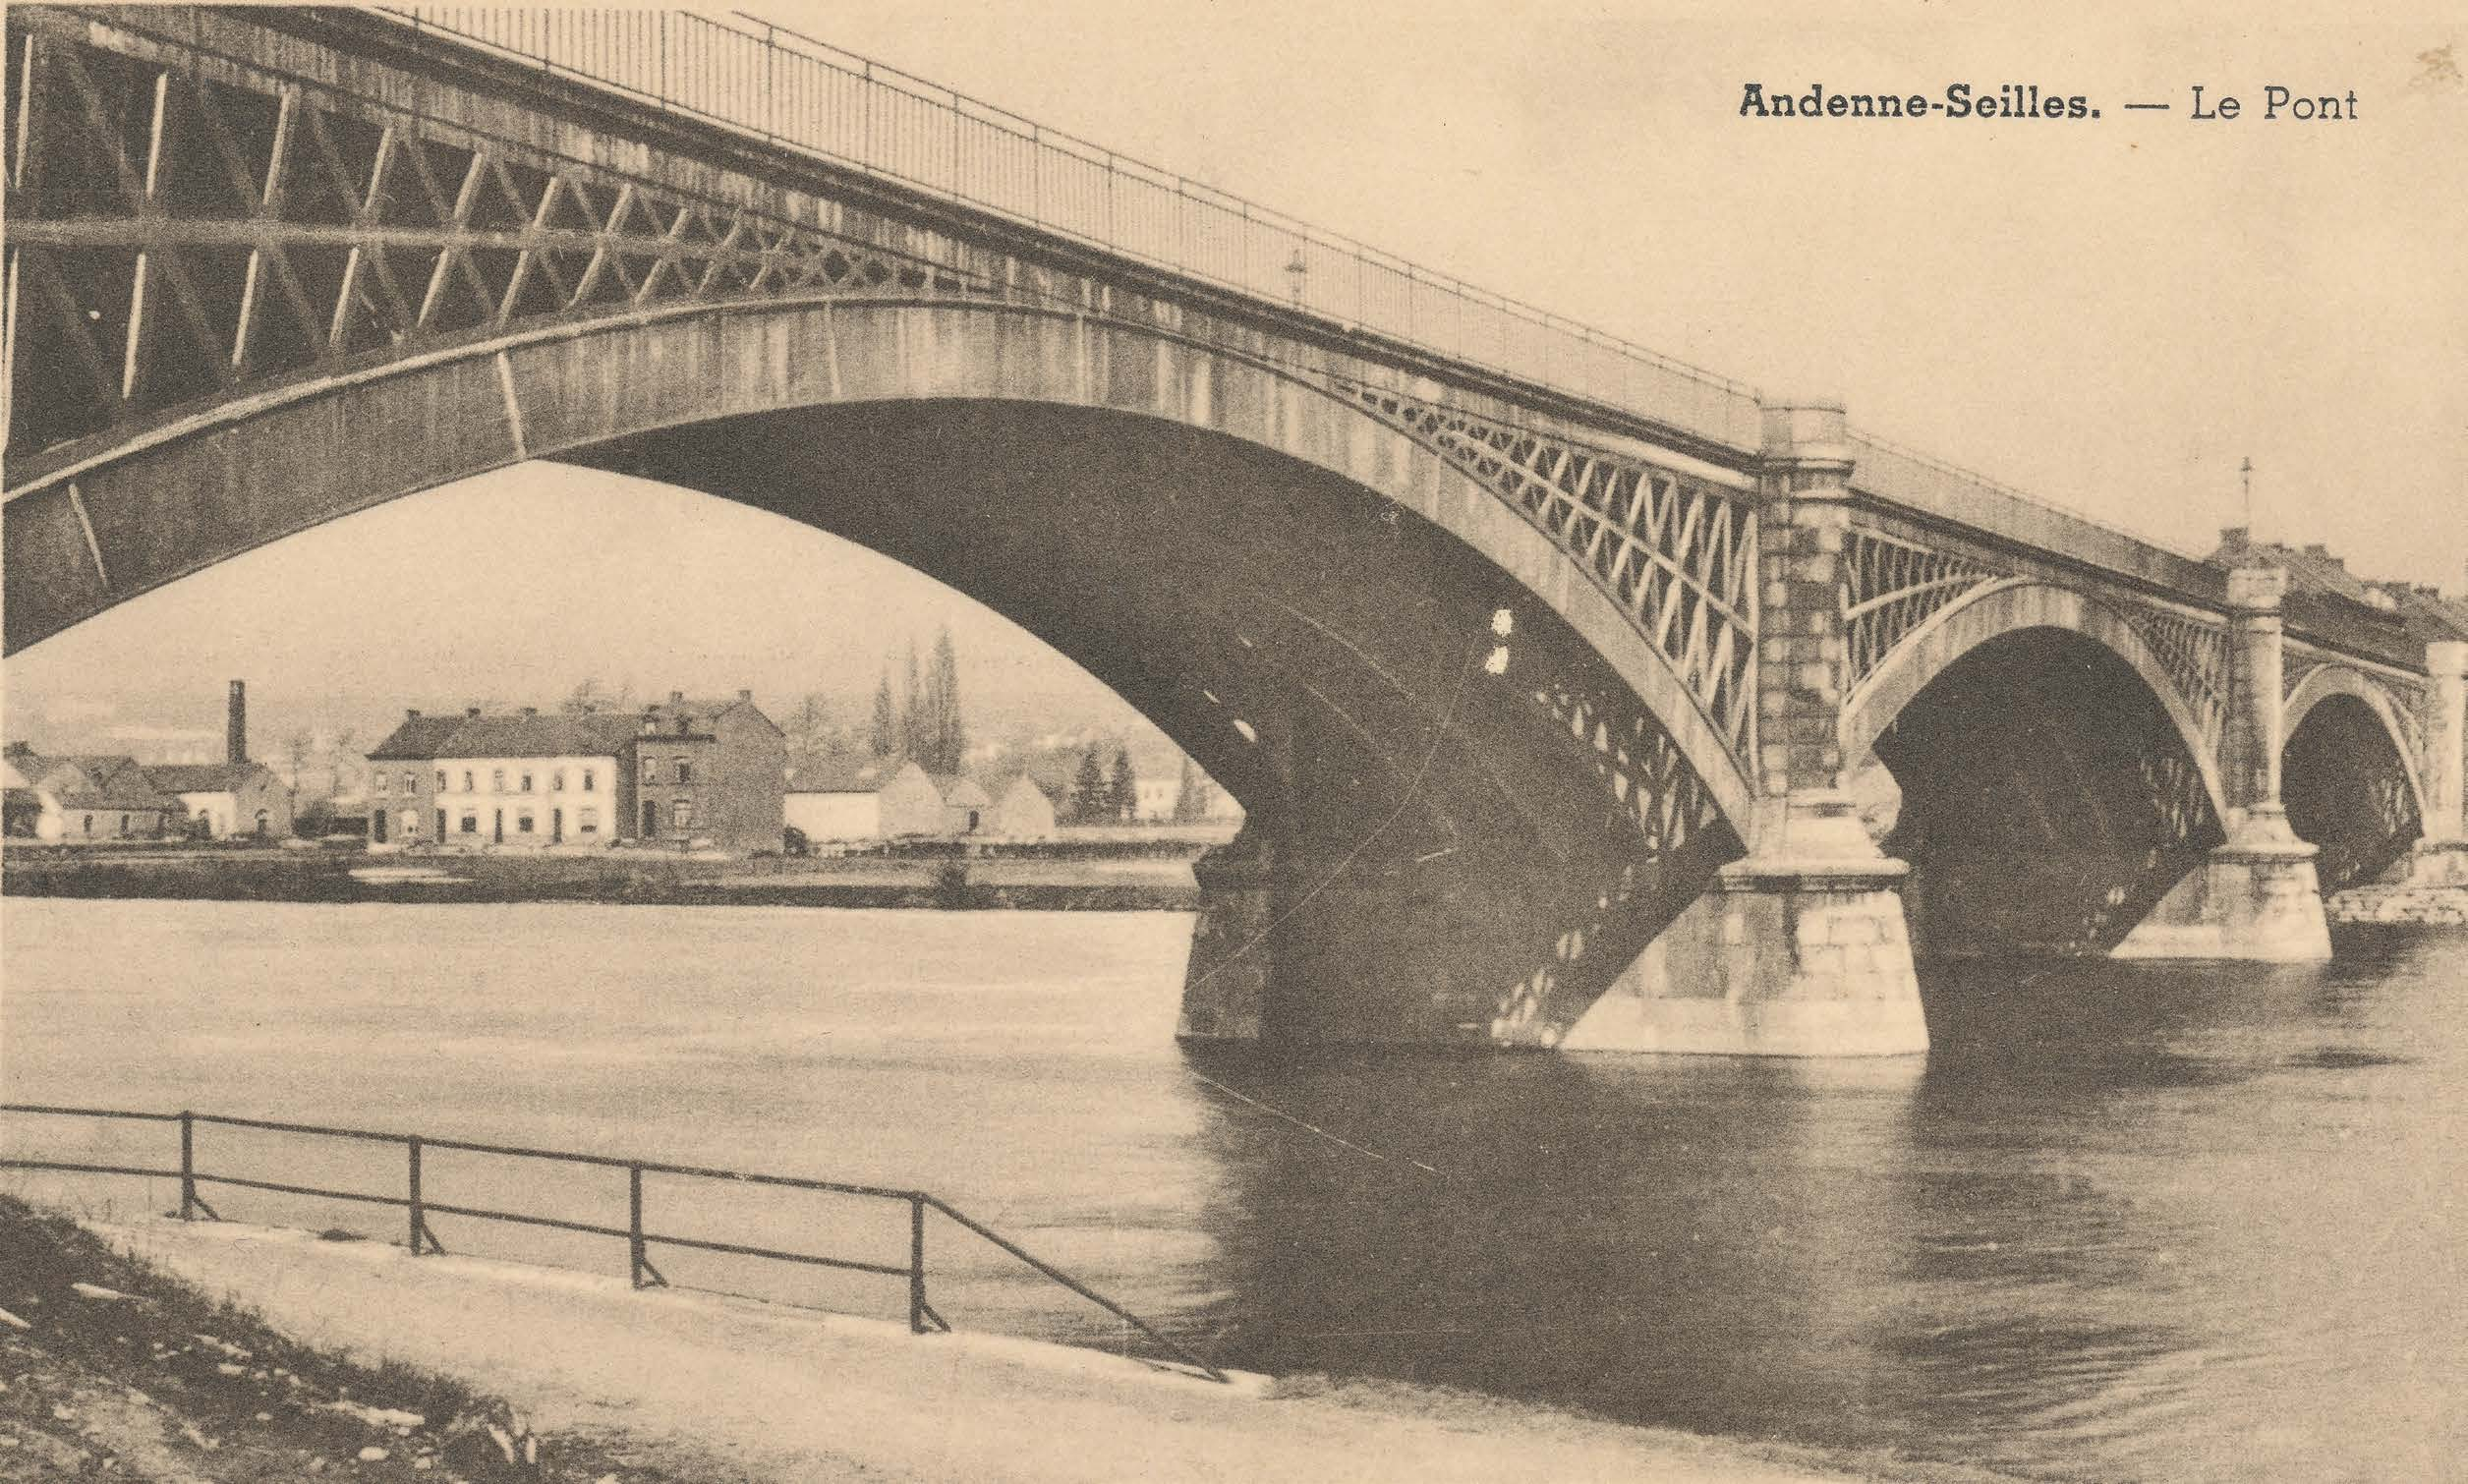 Carte postale du pont d'Andenne (Biblioteca-Andana, coll. Telly De Vielder).